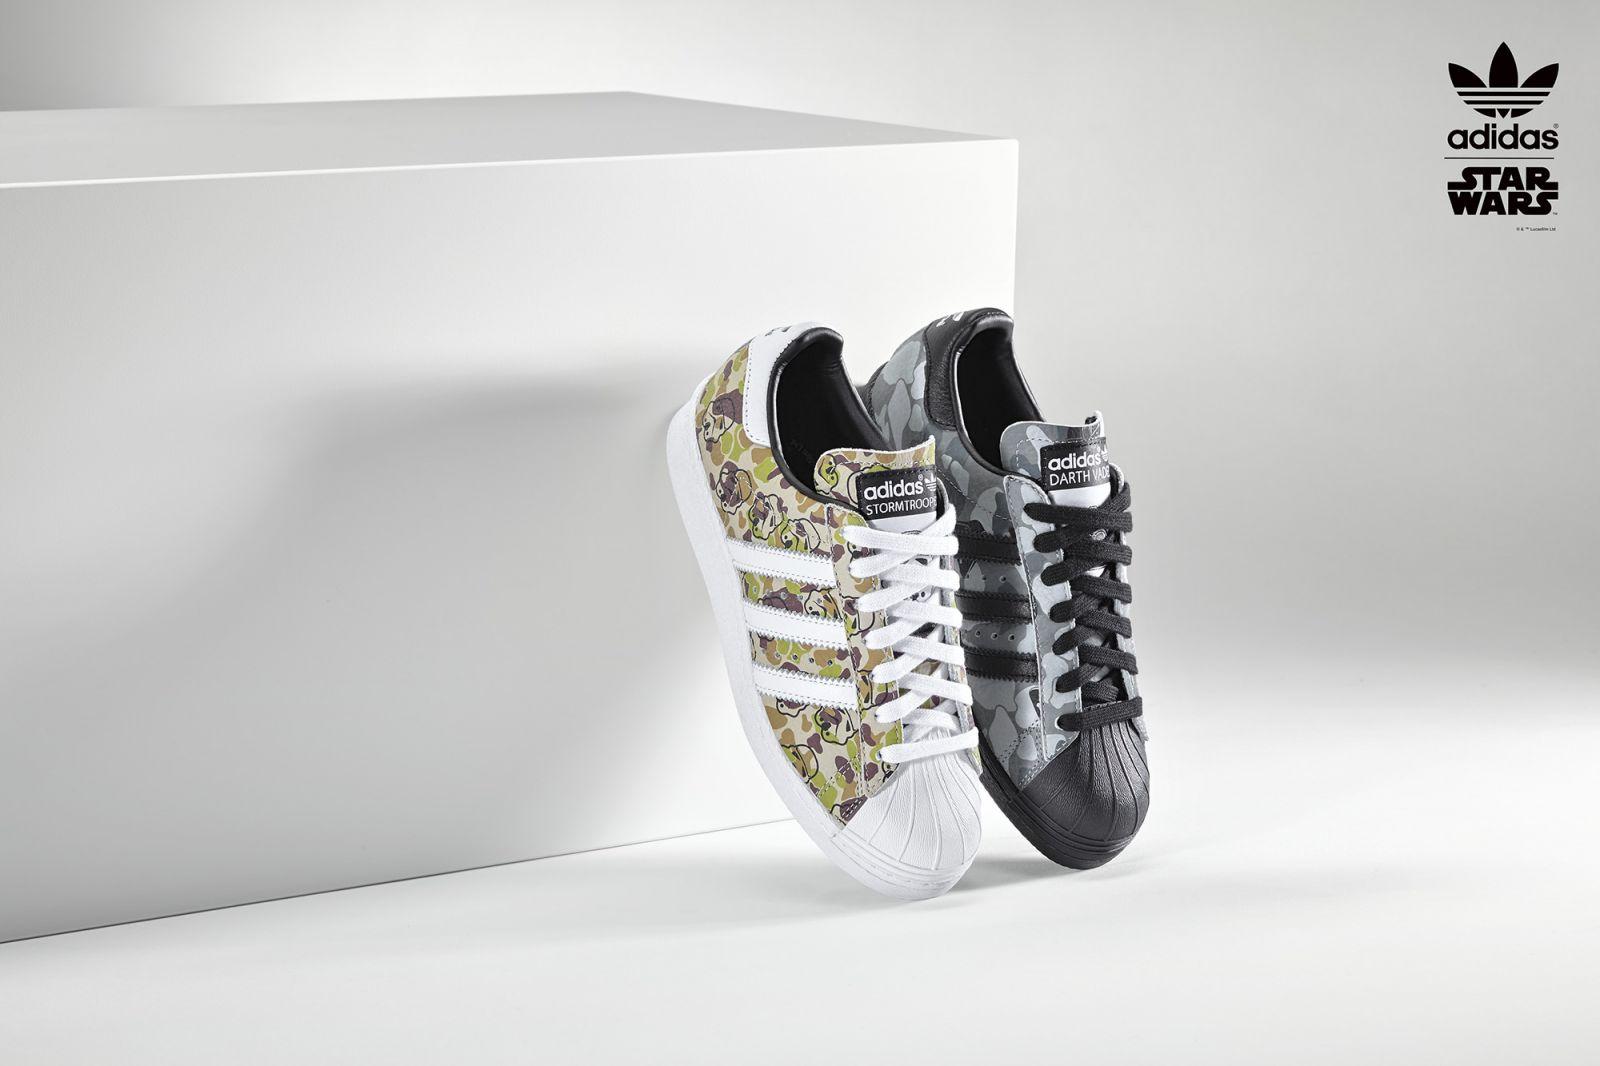 adidas superstar 2016 collection